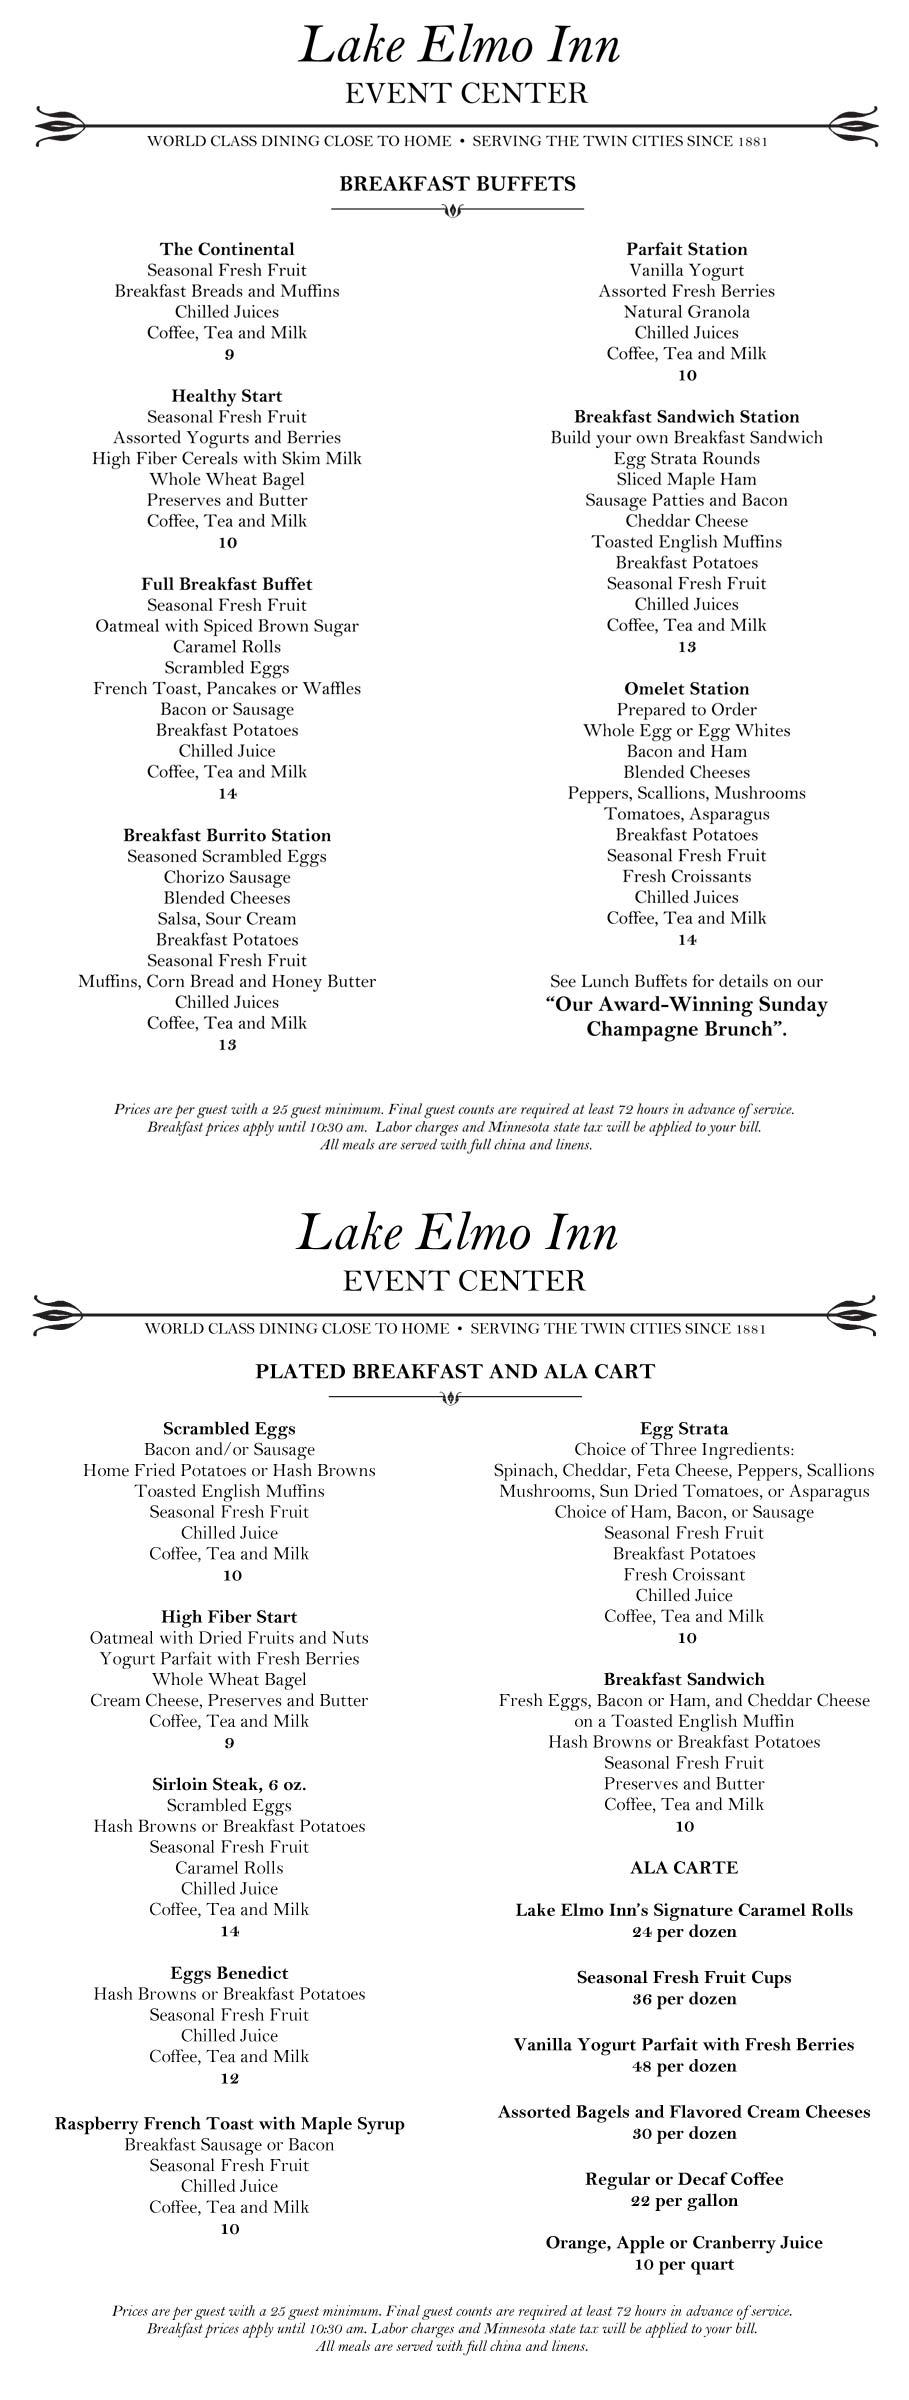 lake elmo inn event center lake elmo mn